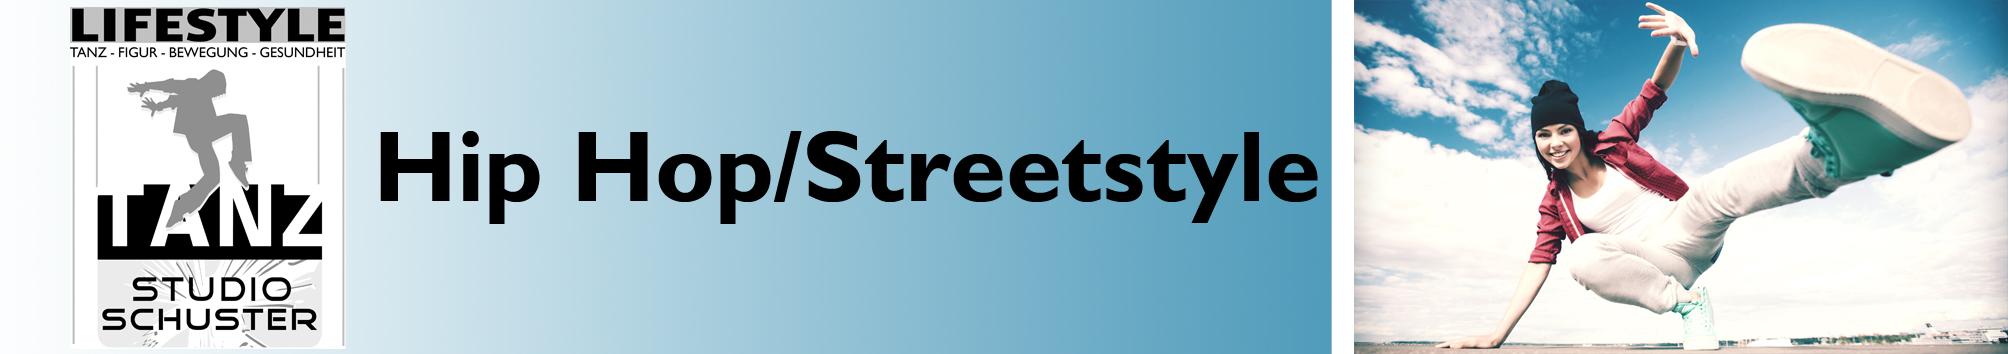 Hip Hop, Streetstyle